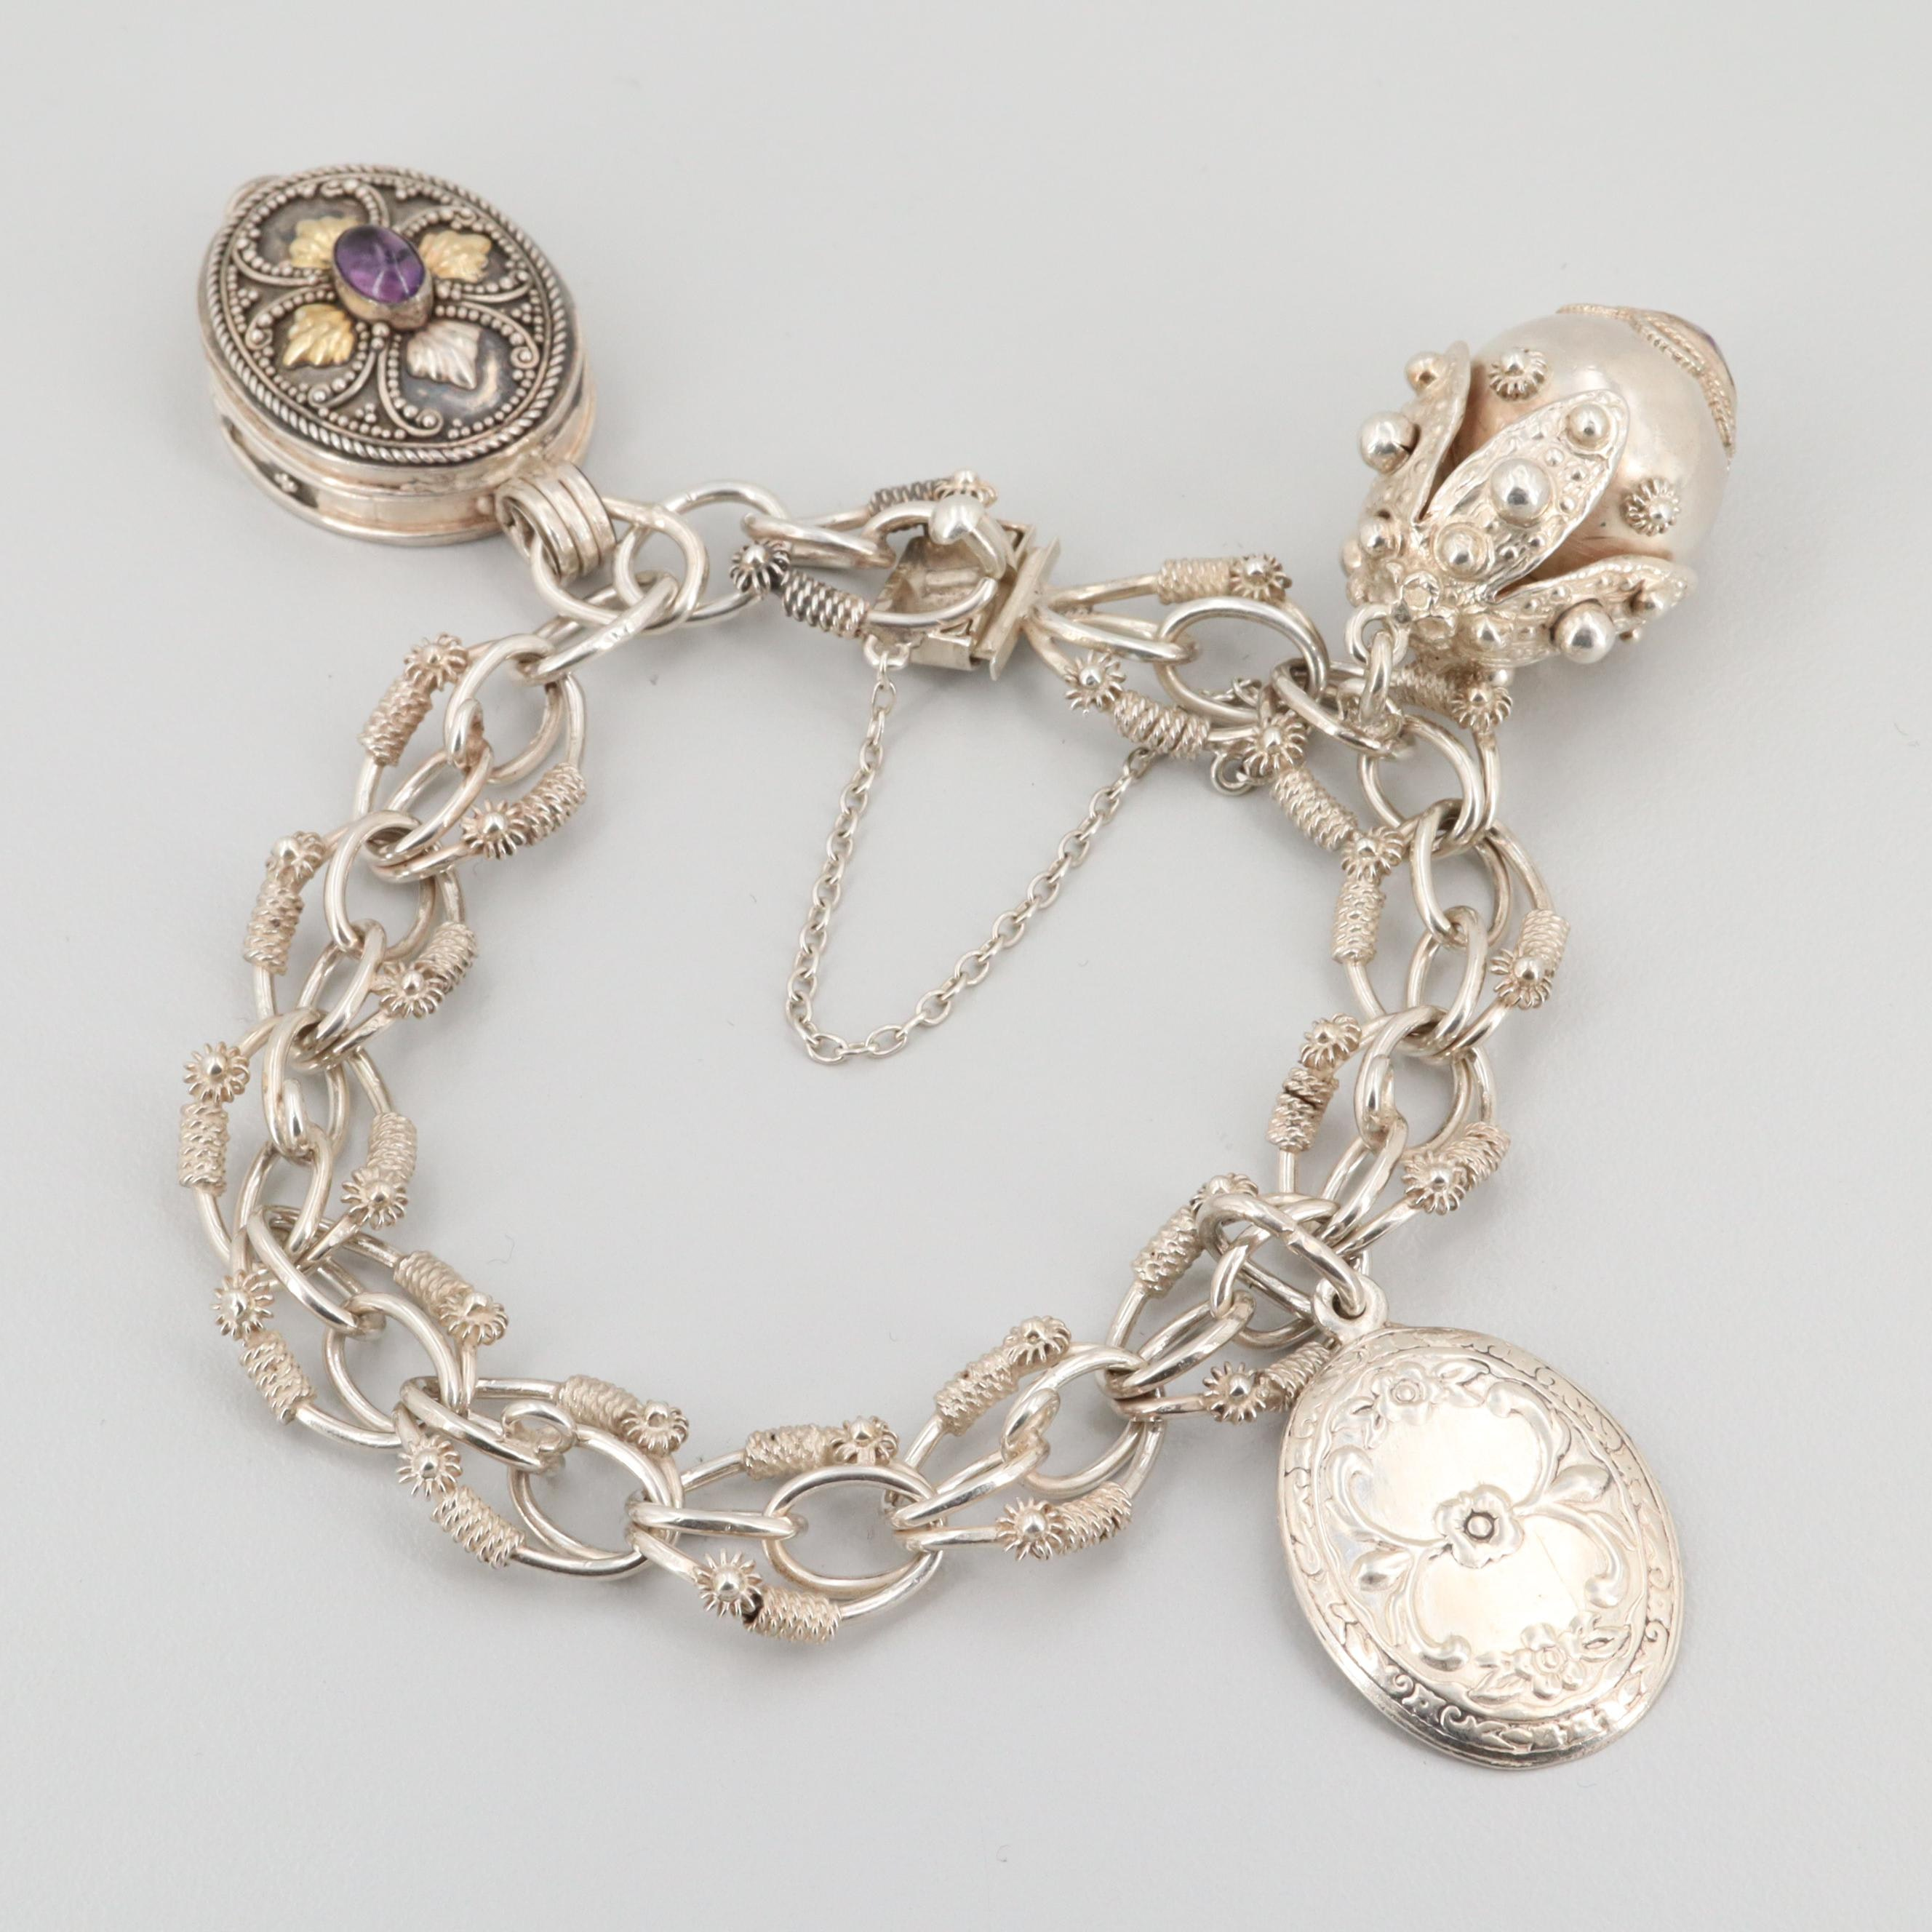 Sterling Silver Amethyst Charm Bracelet Featuring Locket Charm